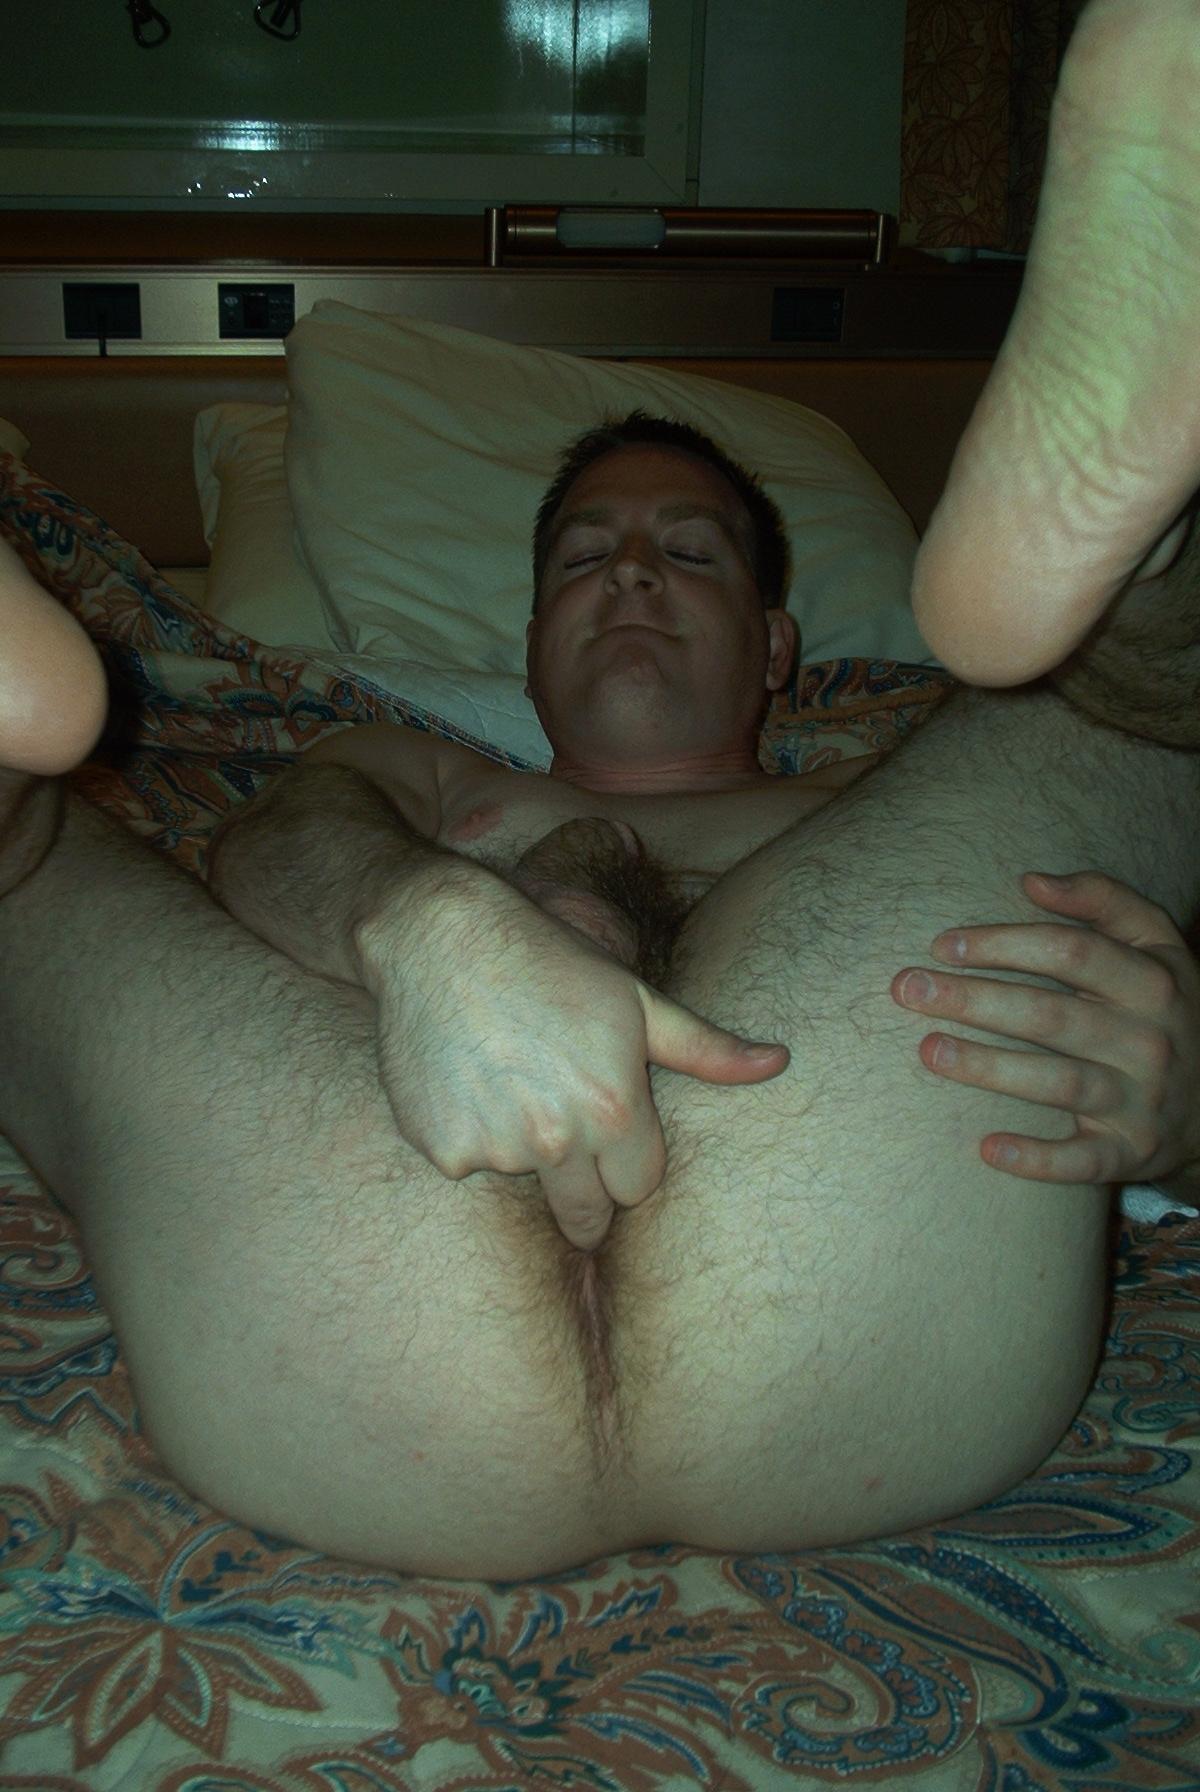 gaymarc